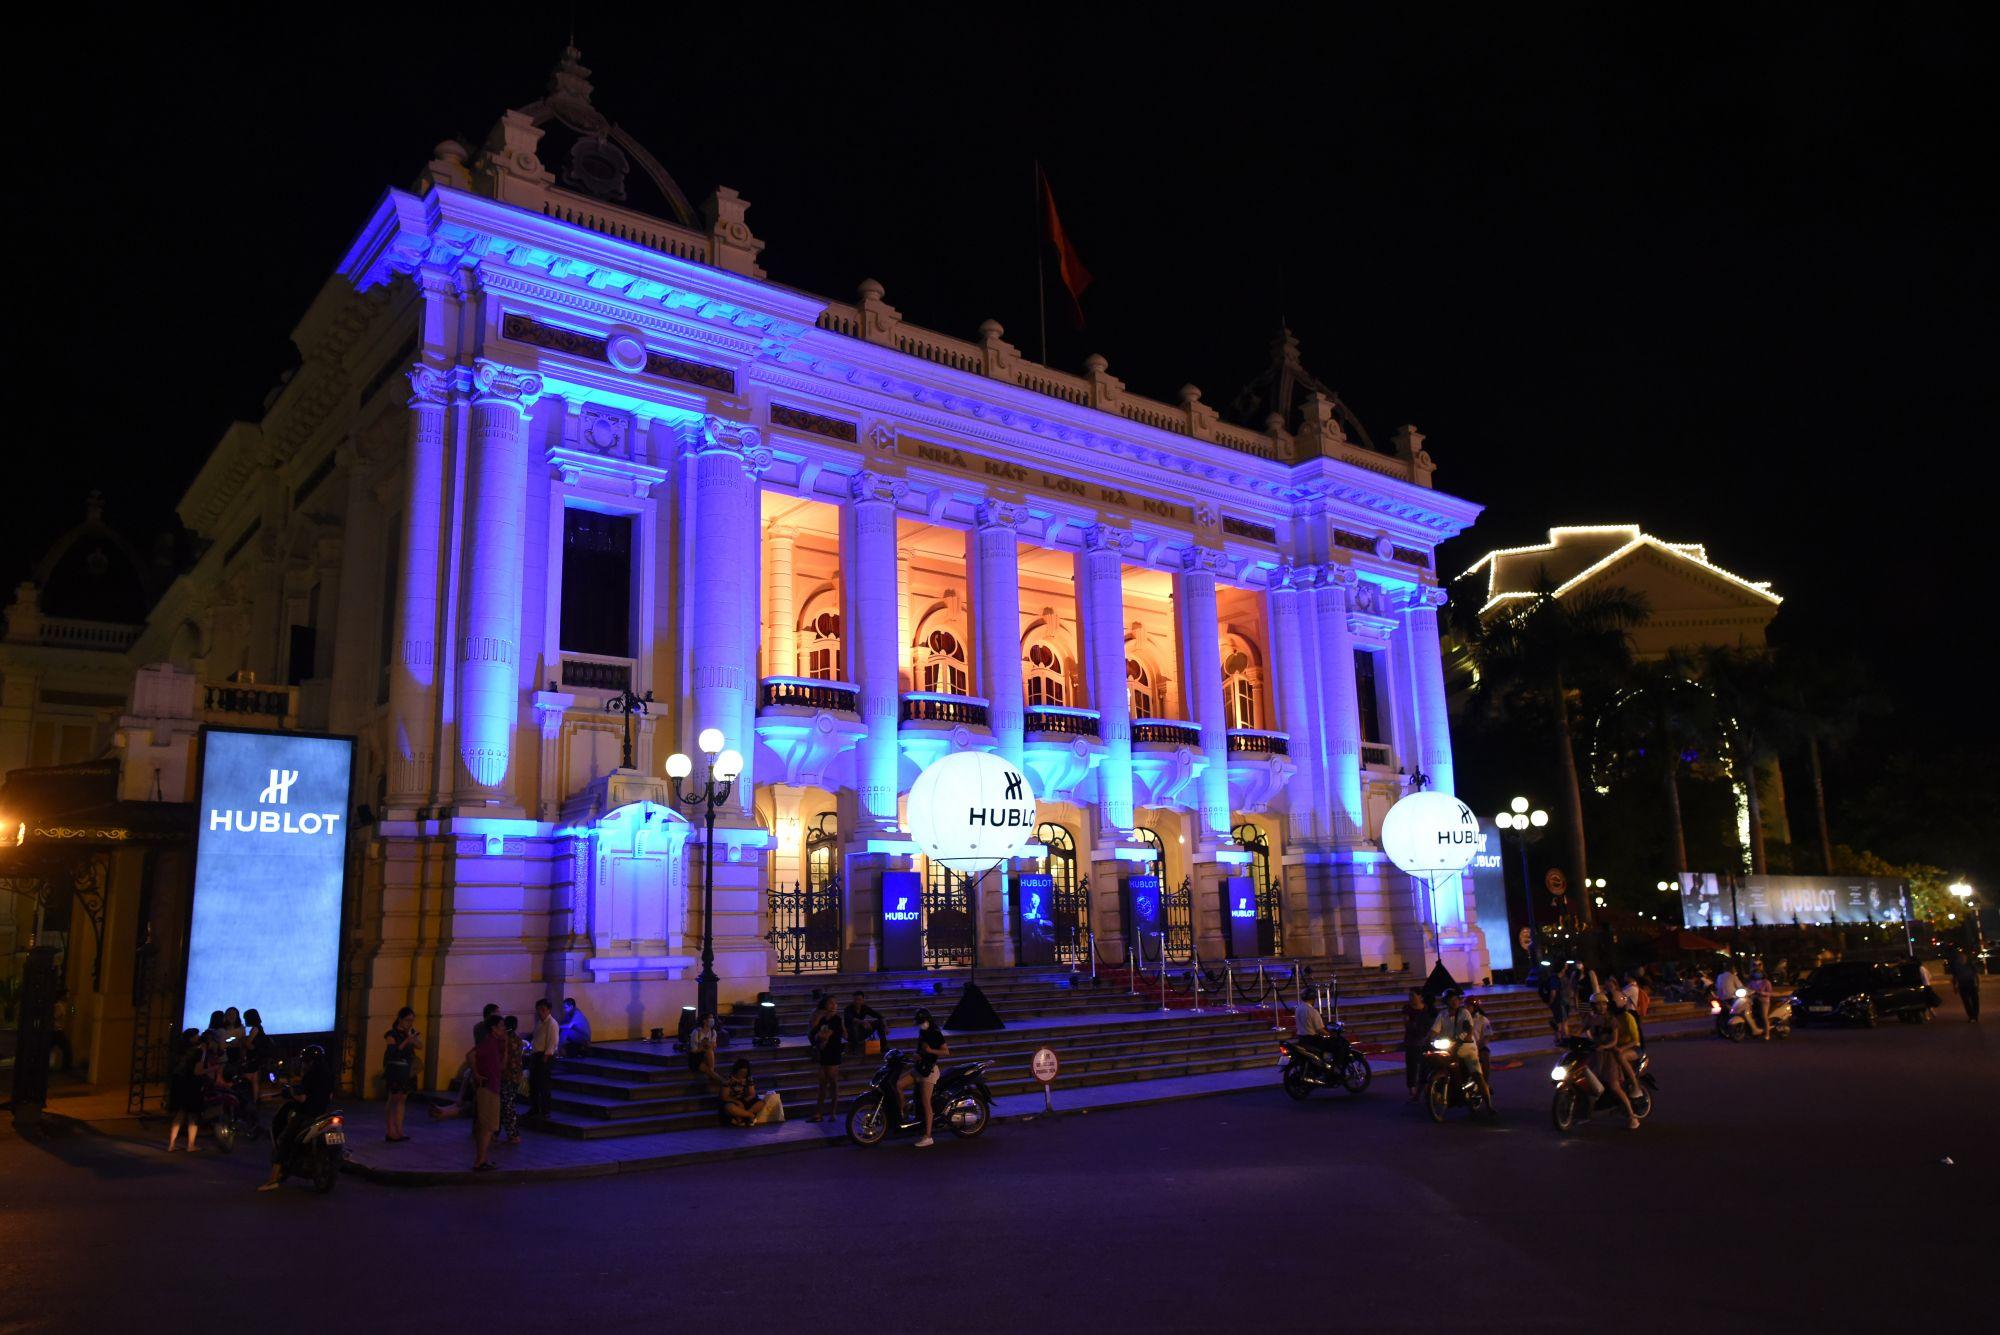 Hublot Debuts With A Big Bang In Hanoi